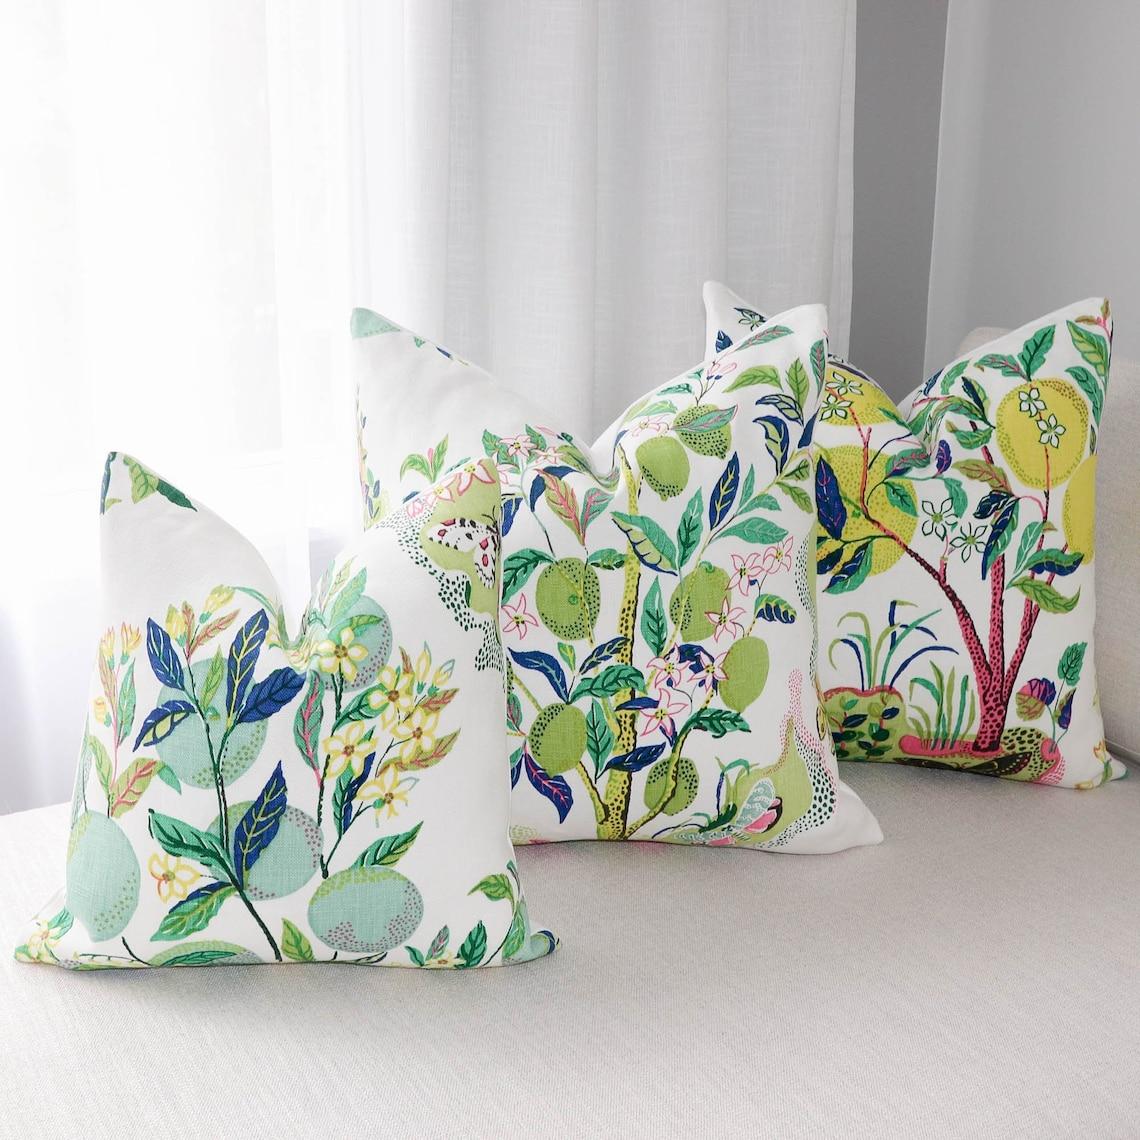 Schumacher Citrus Garden pillow cover in Lime